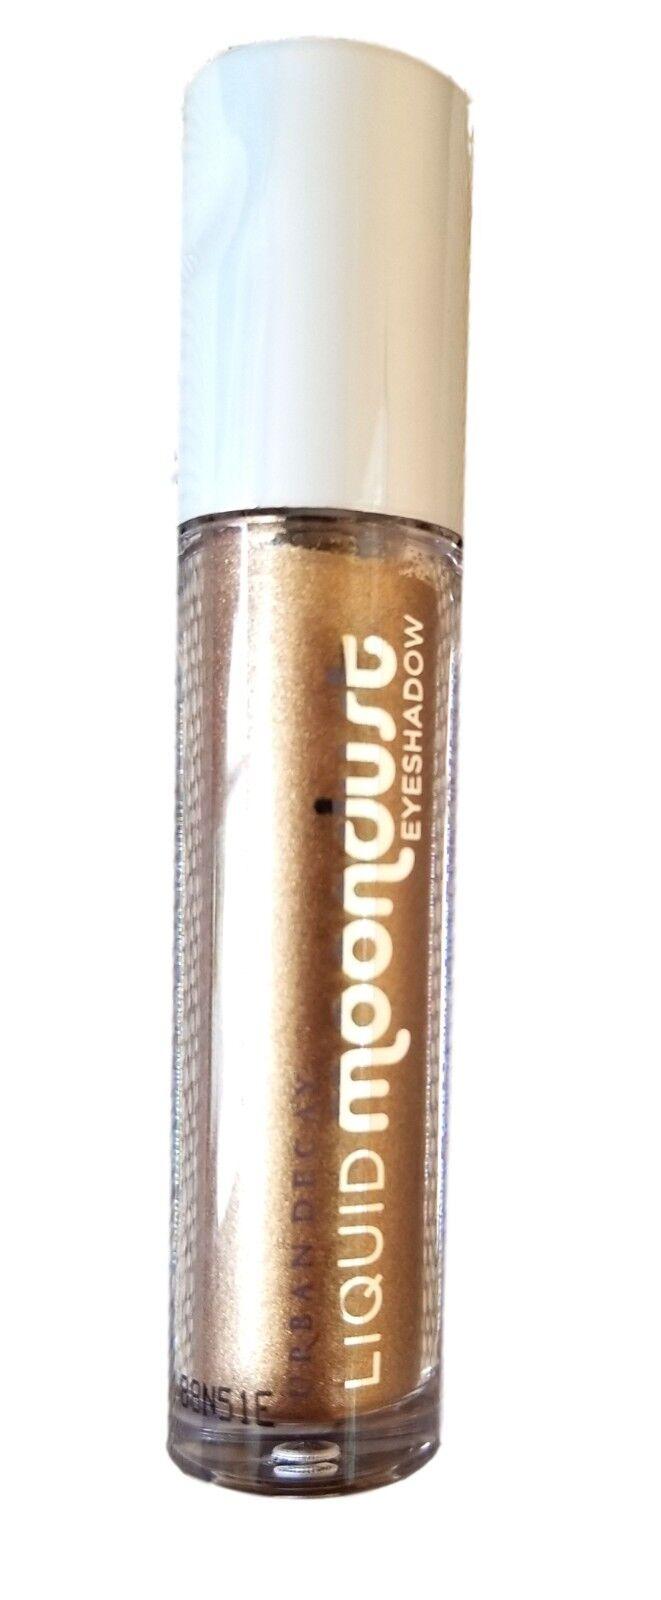 Urban Decay Liquid Moondust Cream Eyeshadow In ZAP NEW Full Size - $1.95